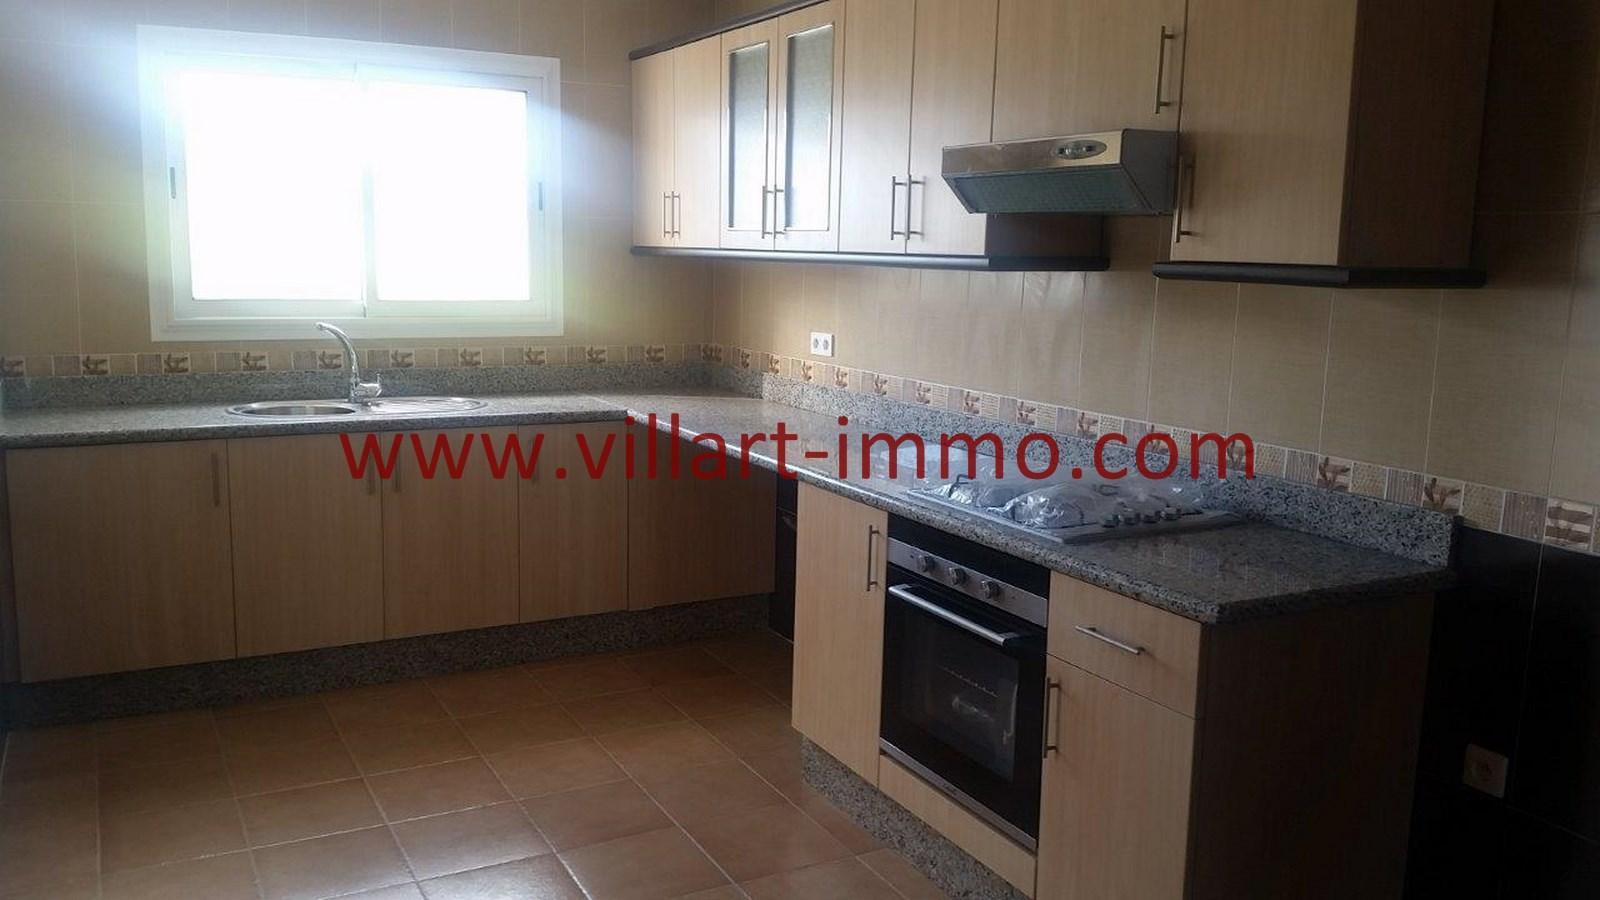 3-vente-appartement-region-tetouan-mdiq-cuisine-2-va395-villart-immo